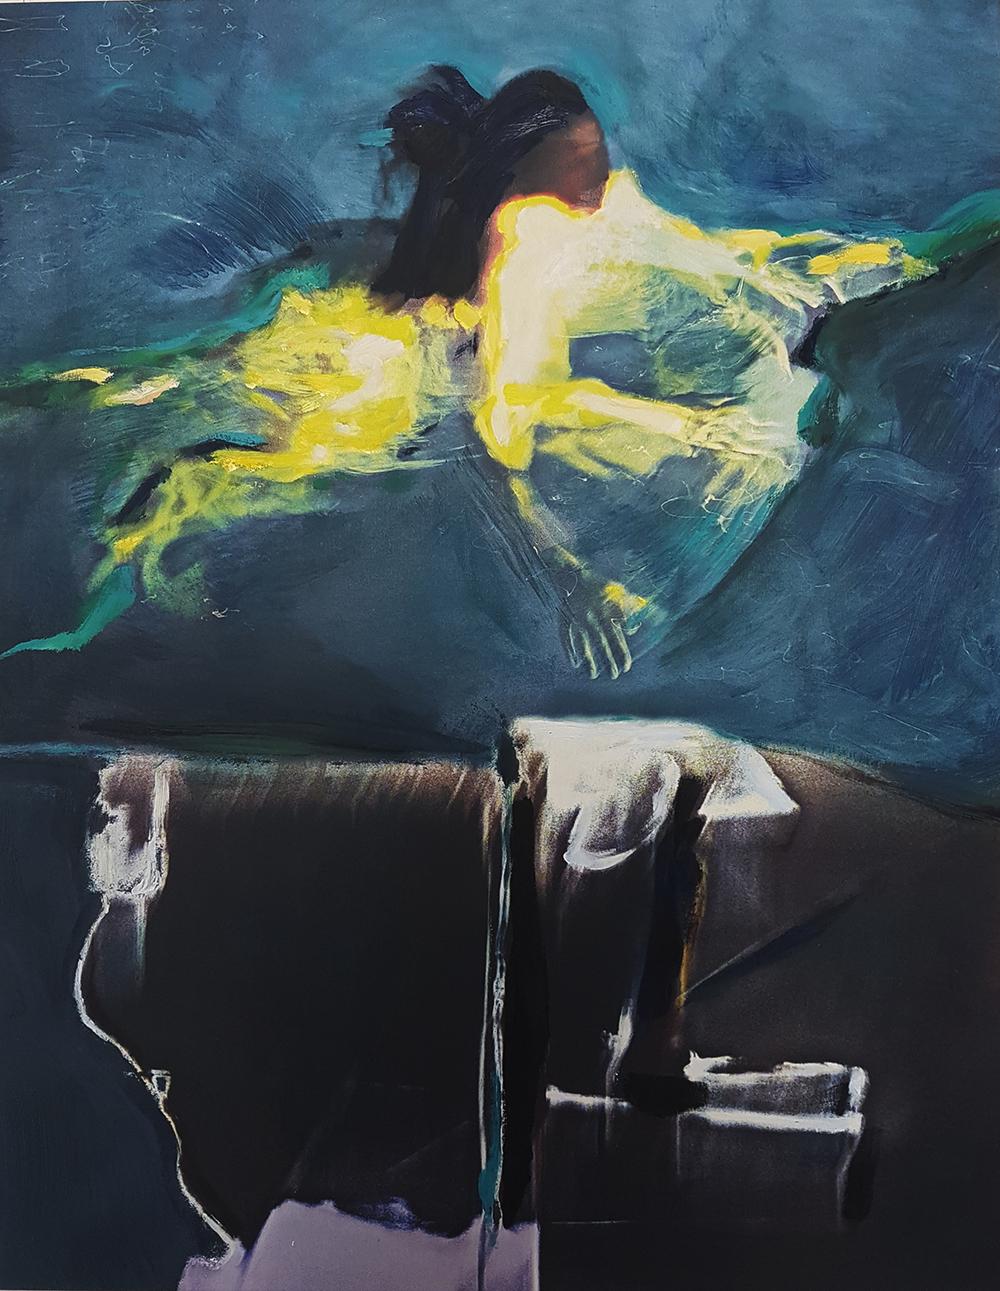 Andrew Hart Adler  Aqua Lady VII  Mixed media and digital print on canvas  123 x 97 cm